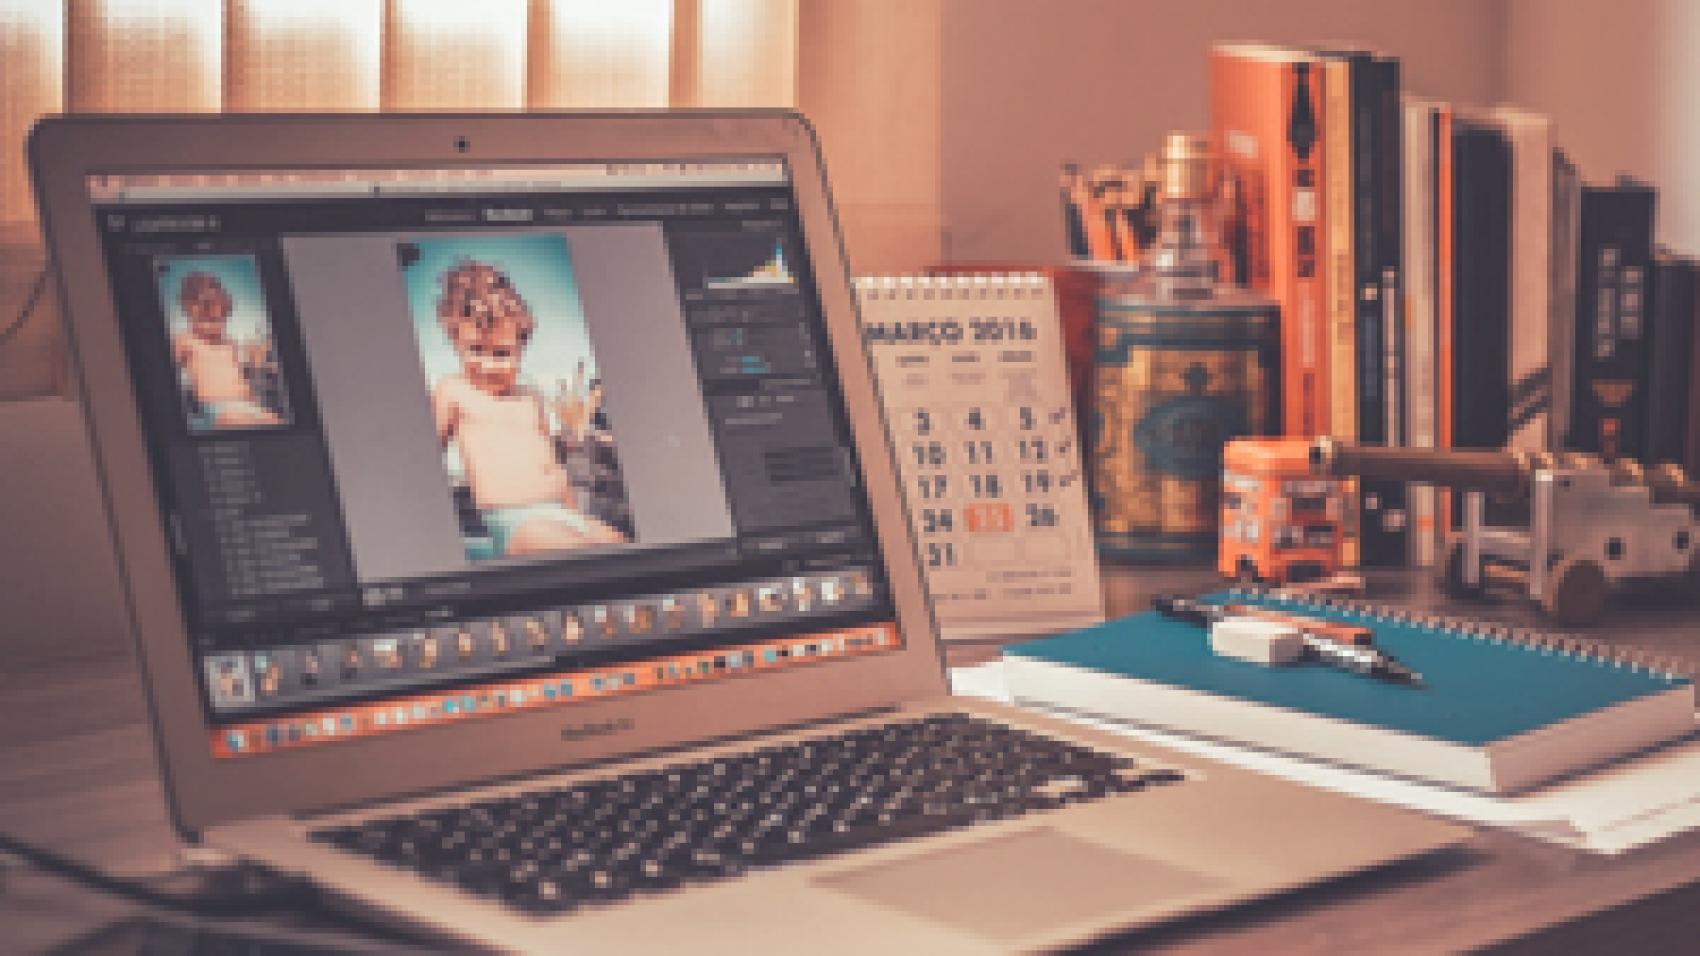 social media images: enhancing tricks